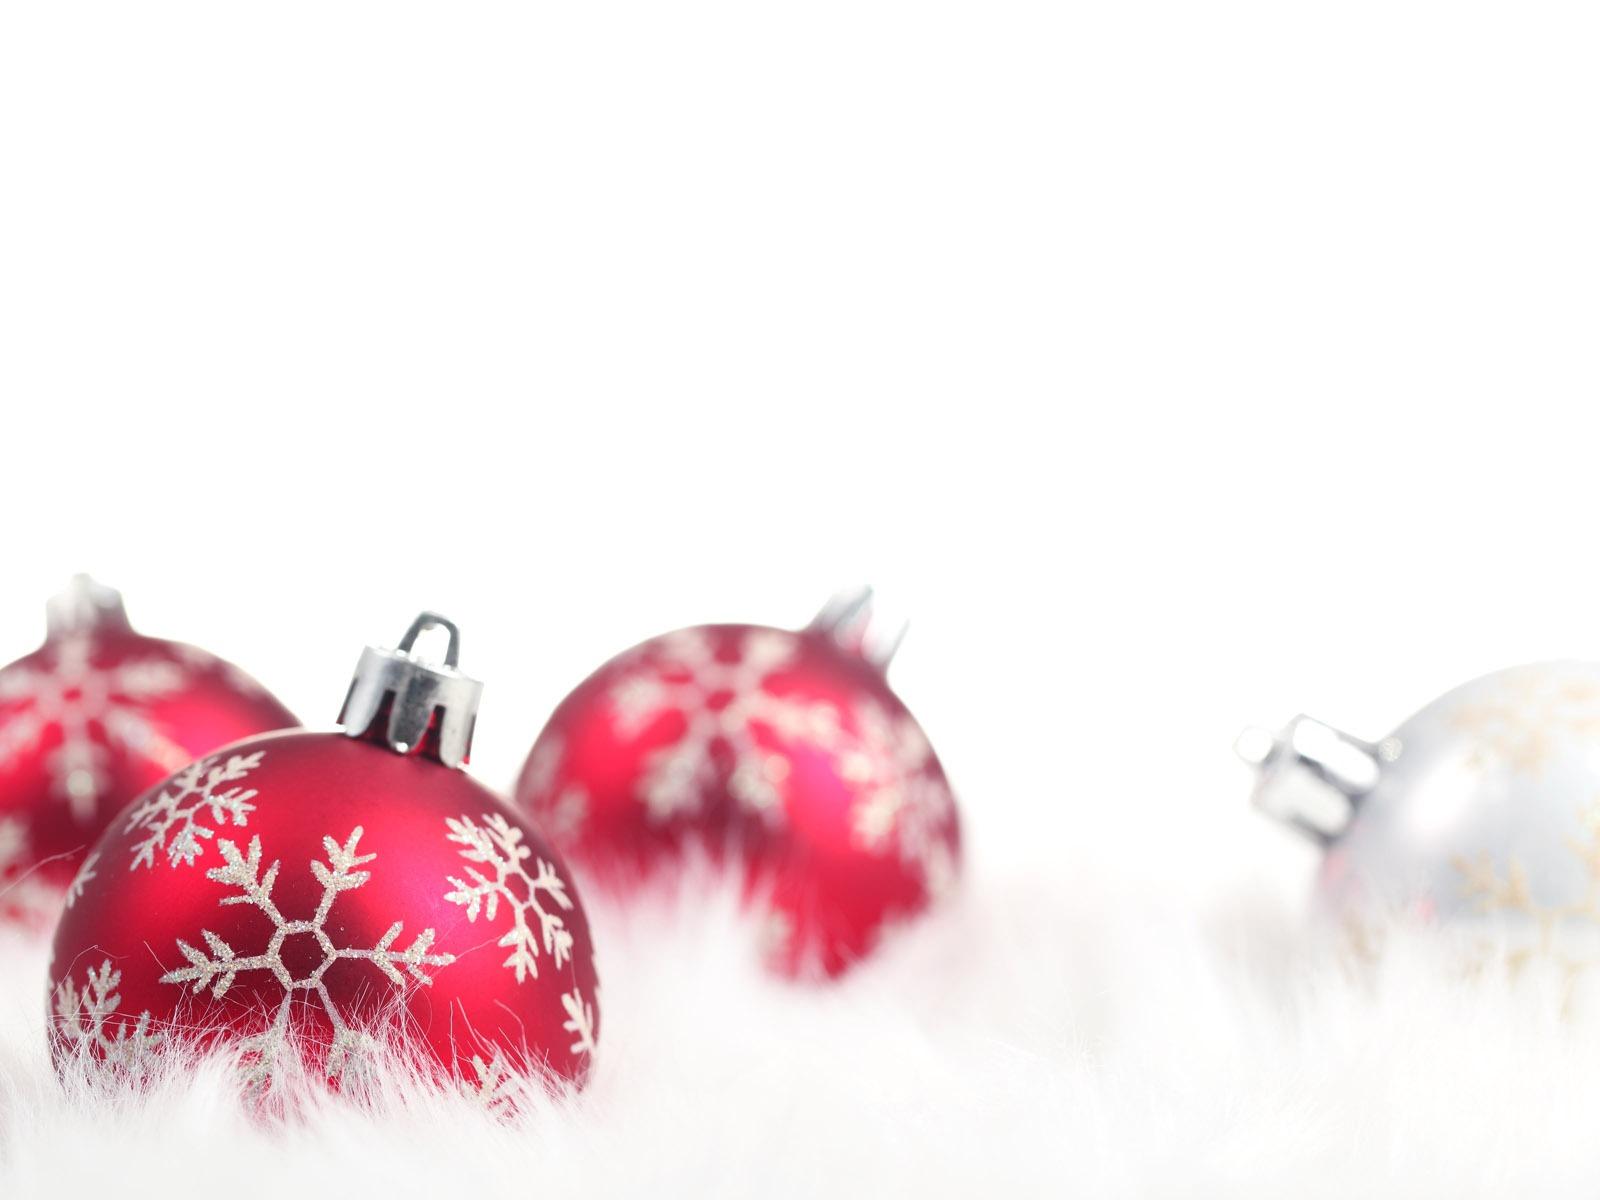 Christmas balls wallpaper (2) #15 - 1600x1200 Wallpaper Download ...